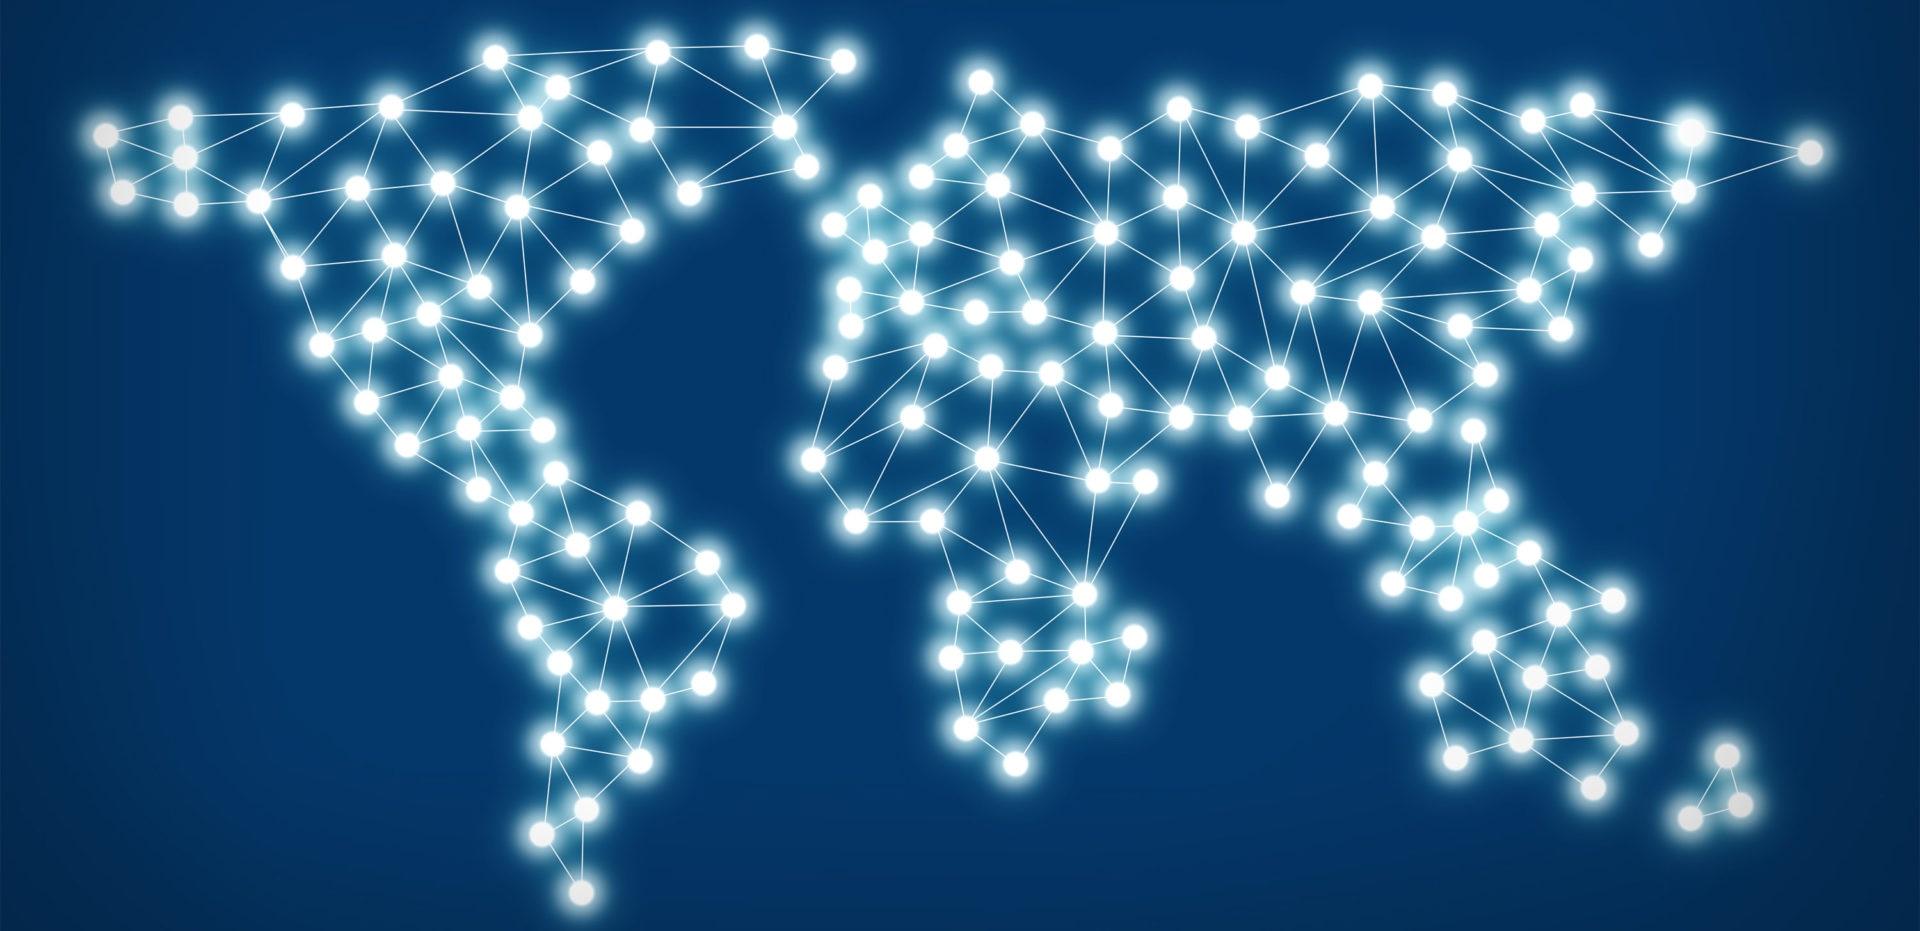 Mundo digital recurso fintech tecnologia países más conectados